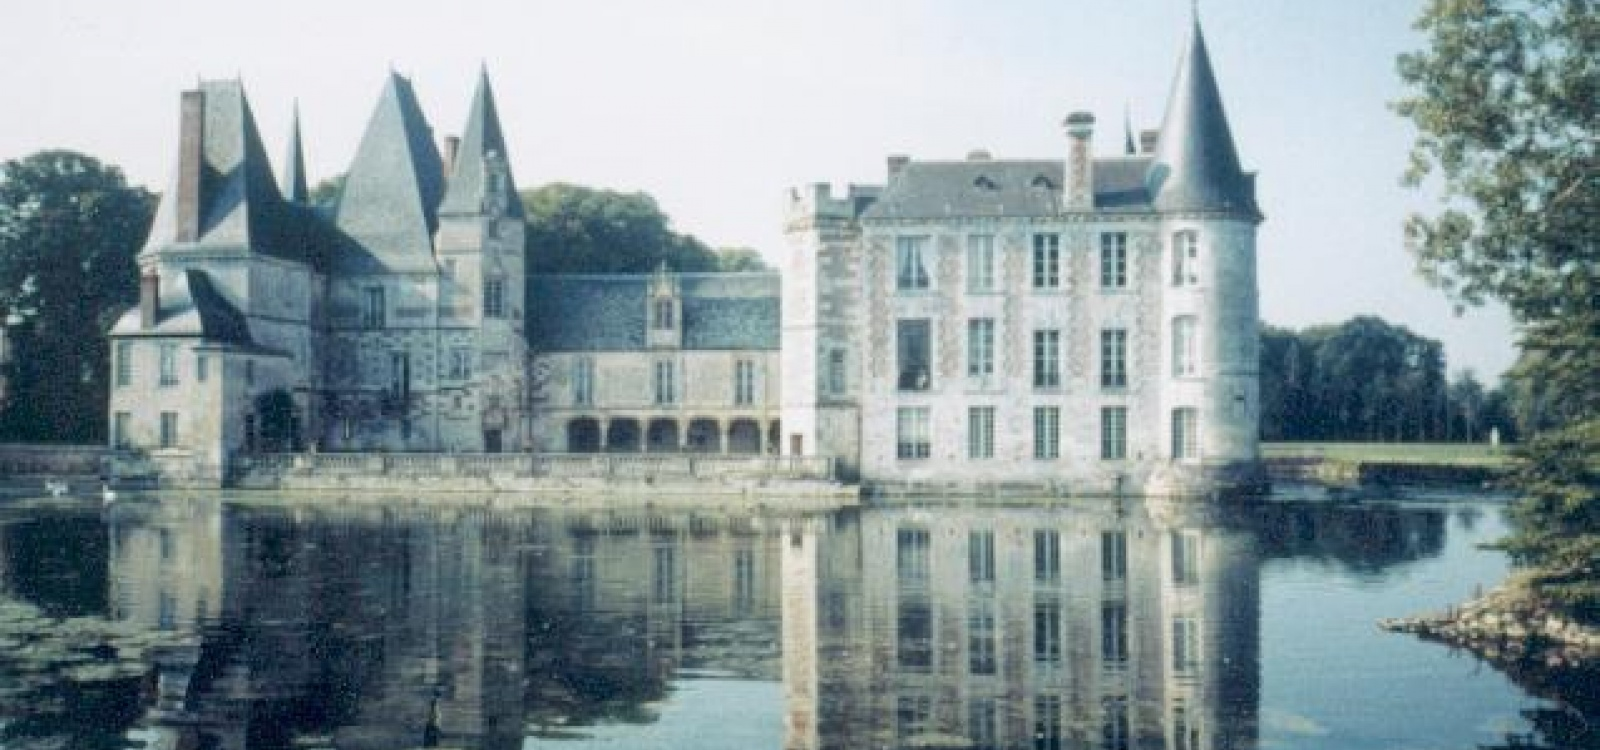 Orne,France,Château,1072